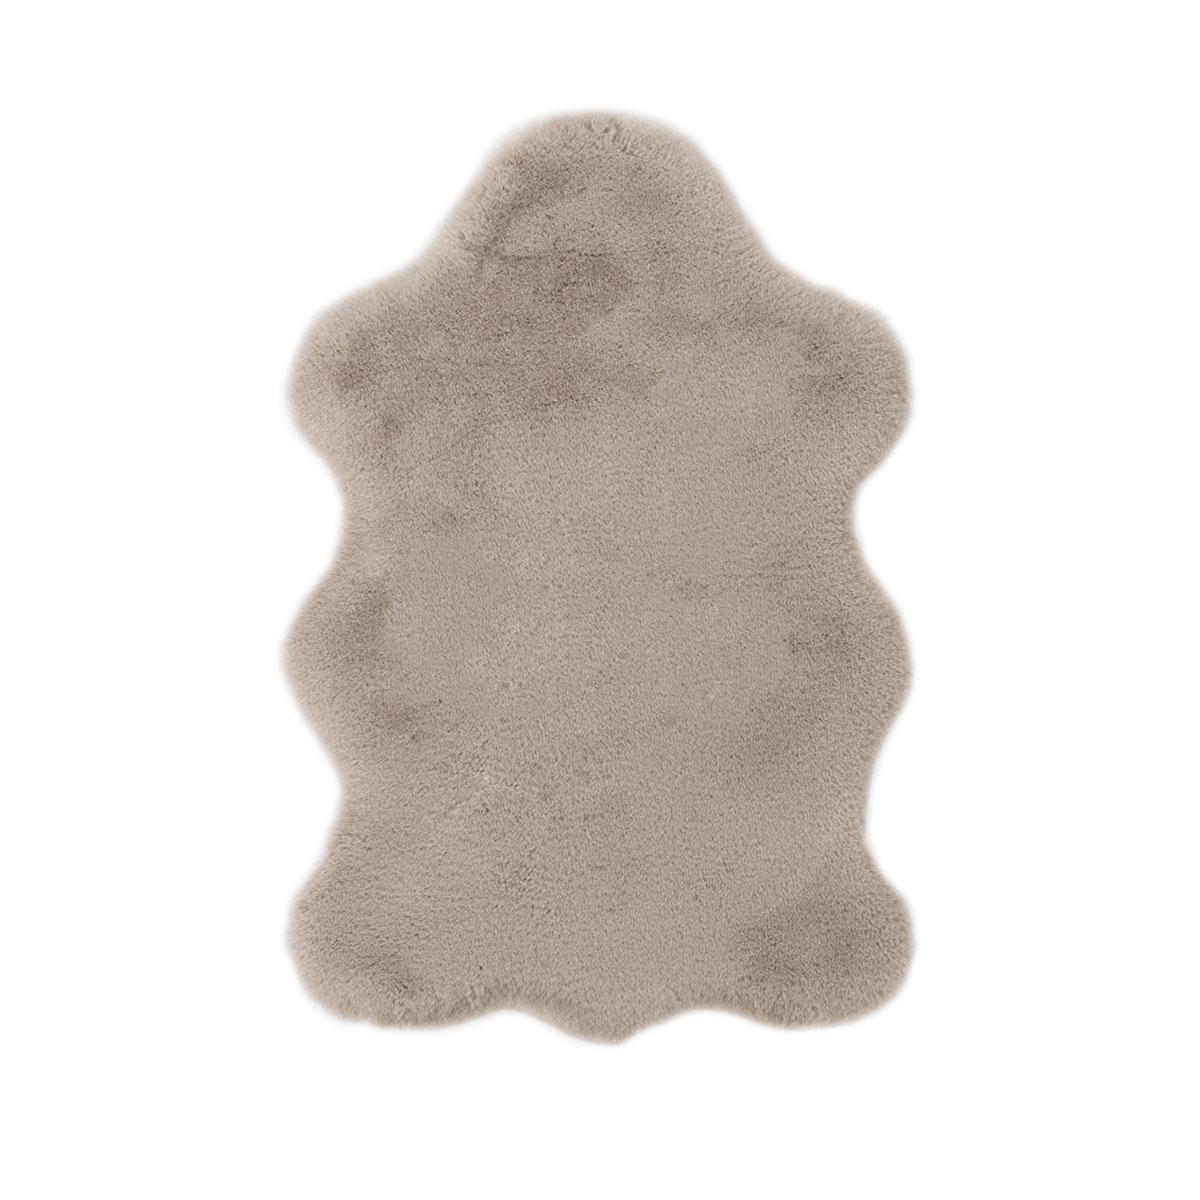 "Teppich ""Cingoli"" 55x80 cm, taupe taupe"